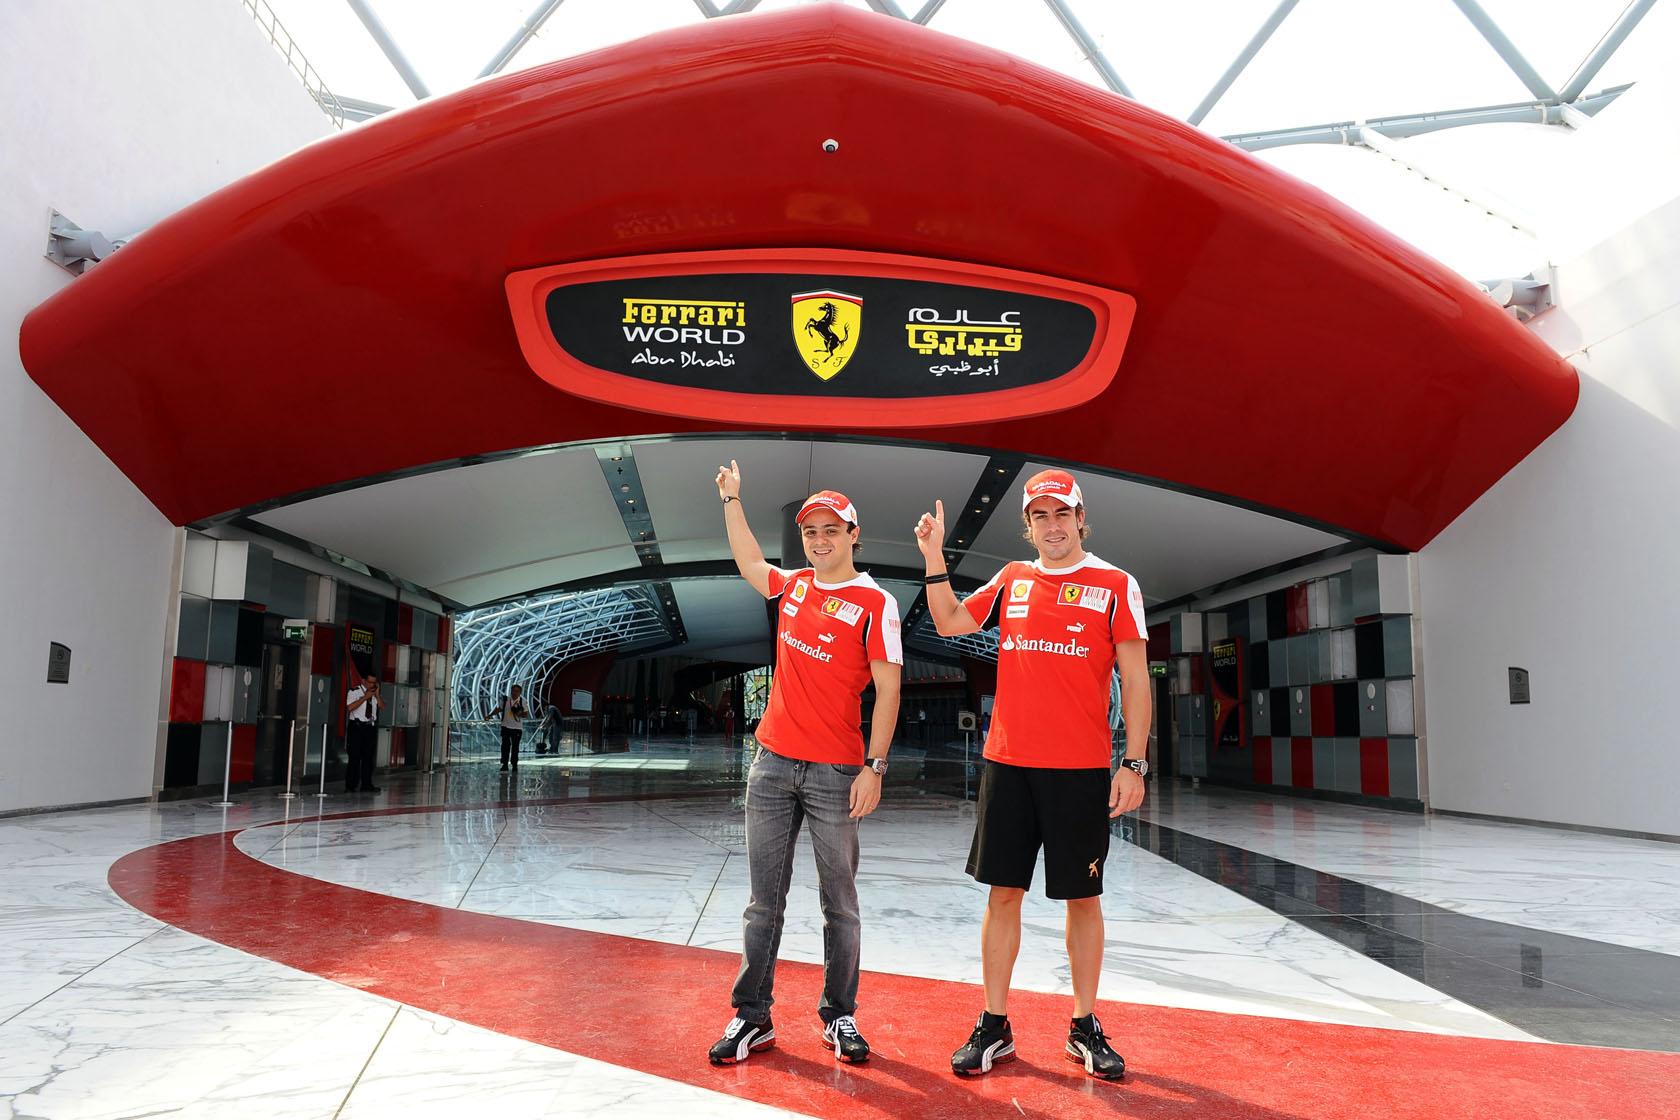 Ferrari-World-2